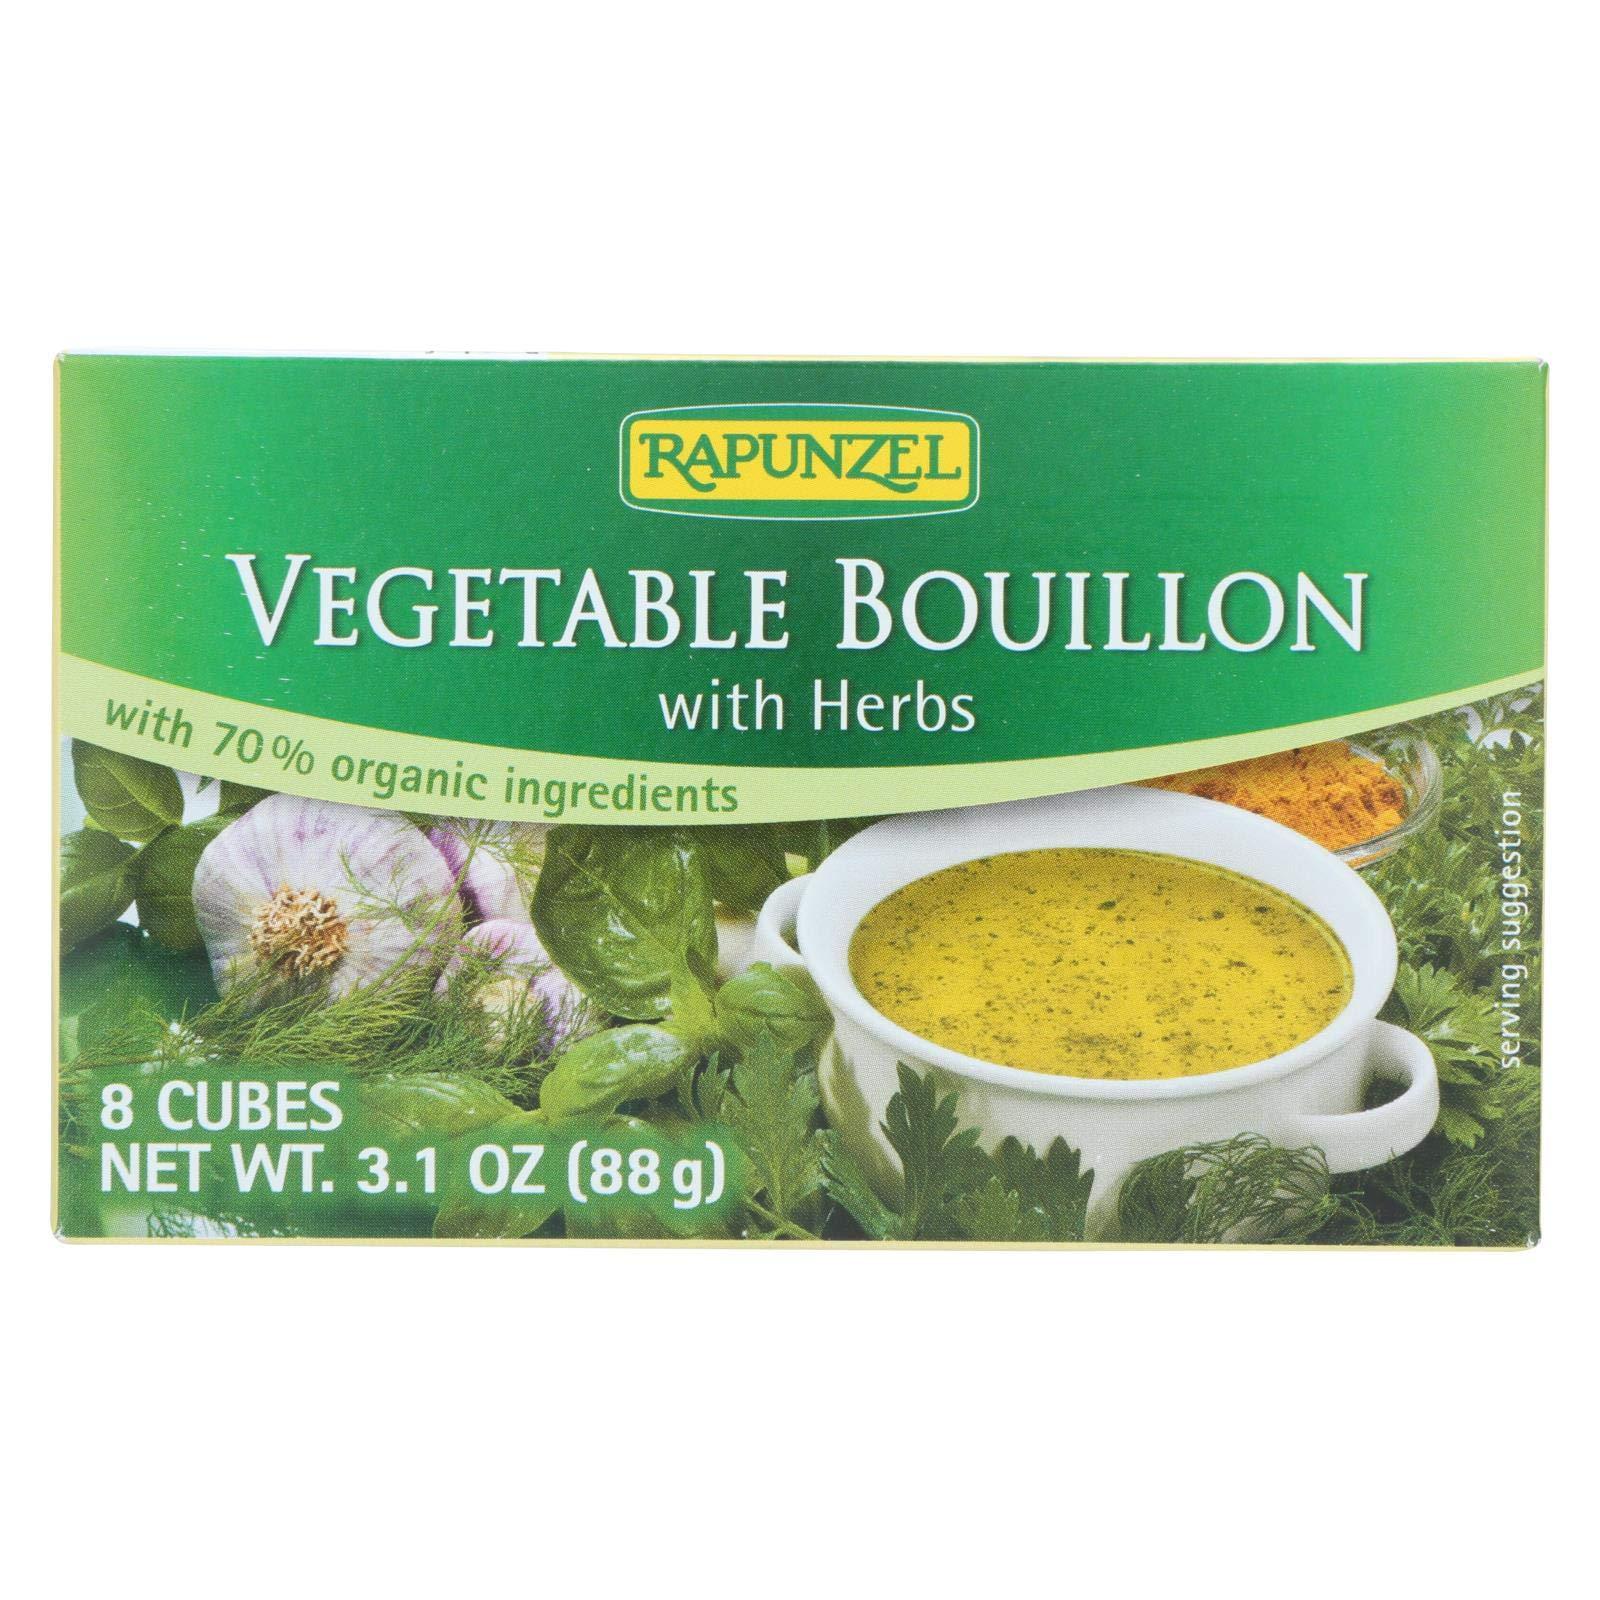 Rapunzel Bouillon Cubes - Vegetable - Vegan - Sea Salt And Herbs - 3.10 Oz - Case Of 12 3.10 OZ by Rapunzel